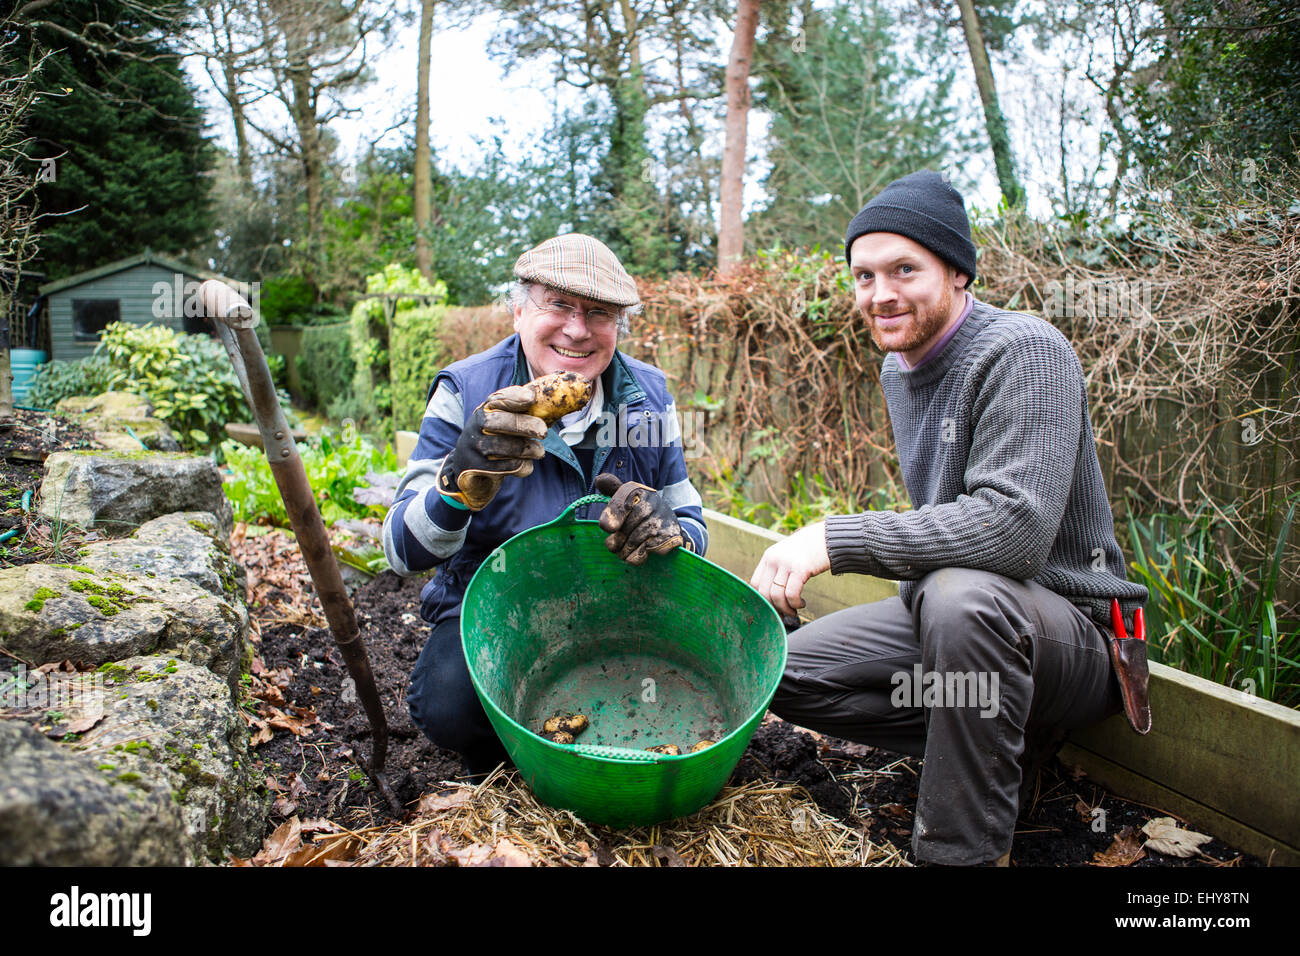 Dos hombres cosechar patatas, Bournemouth, en el Condado de Dorset, Reino Unido, Europa Imagen De Stock